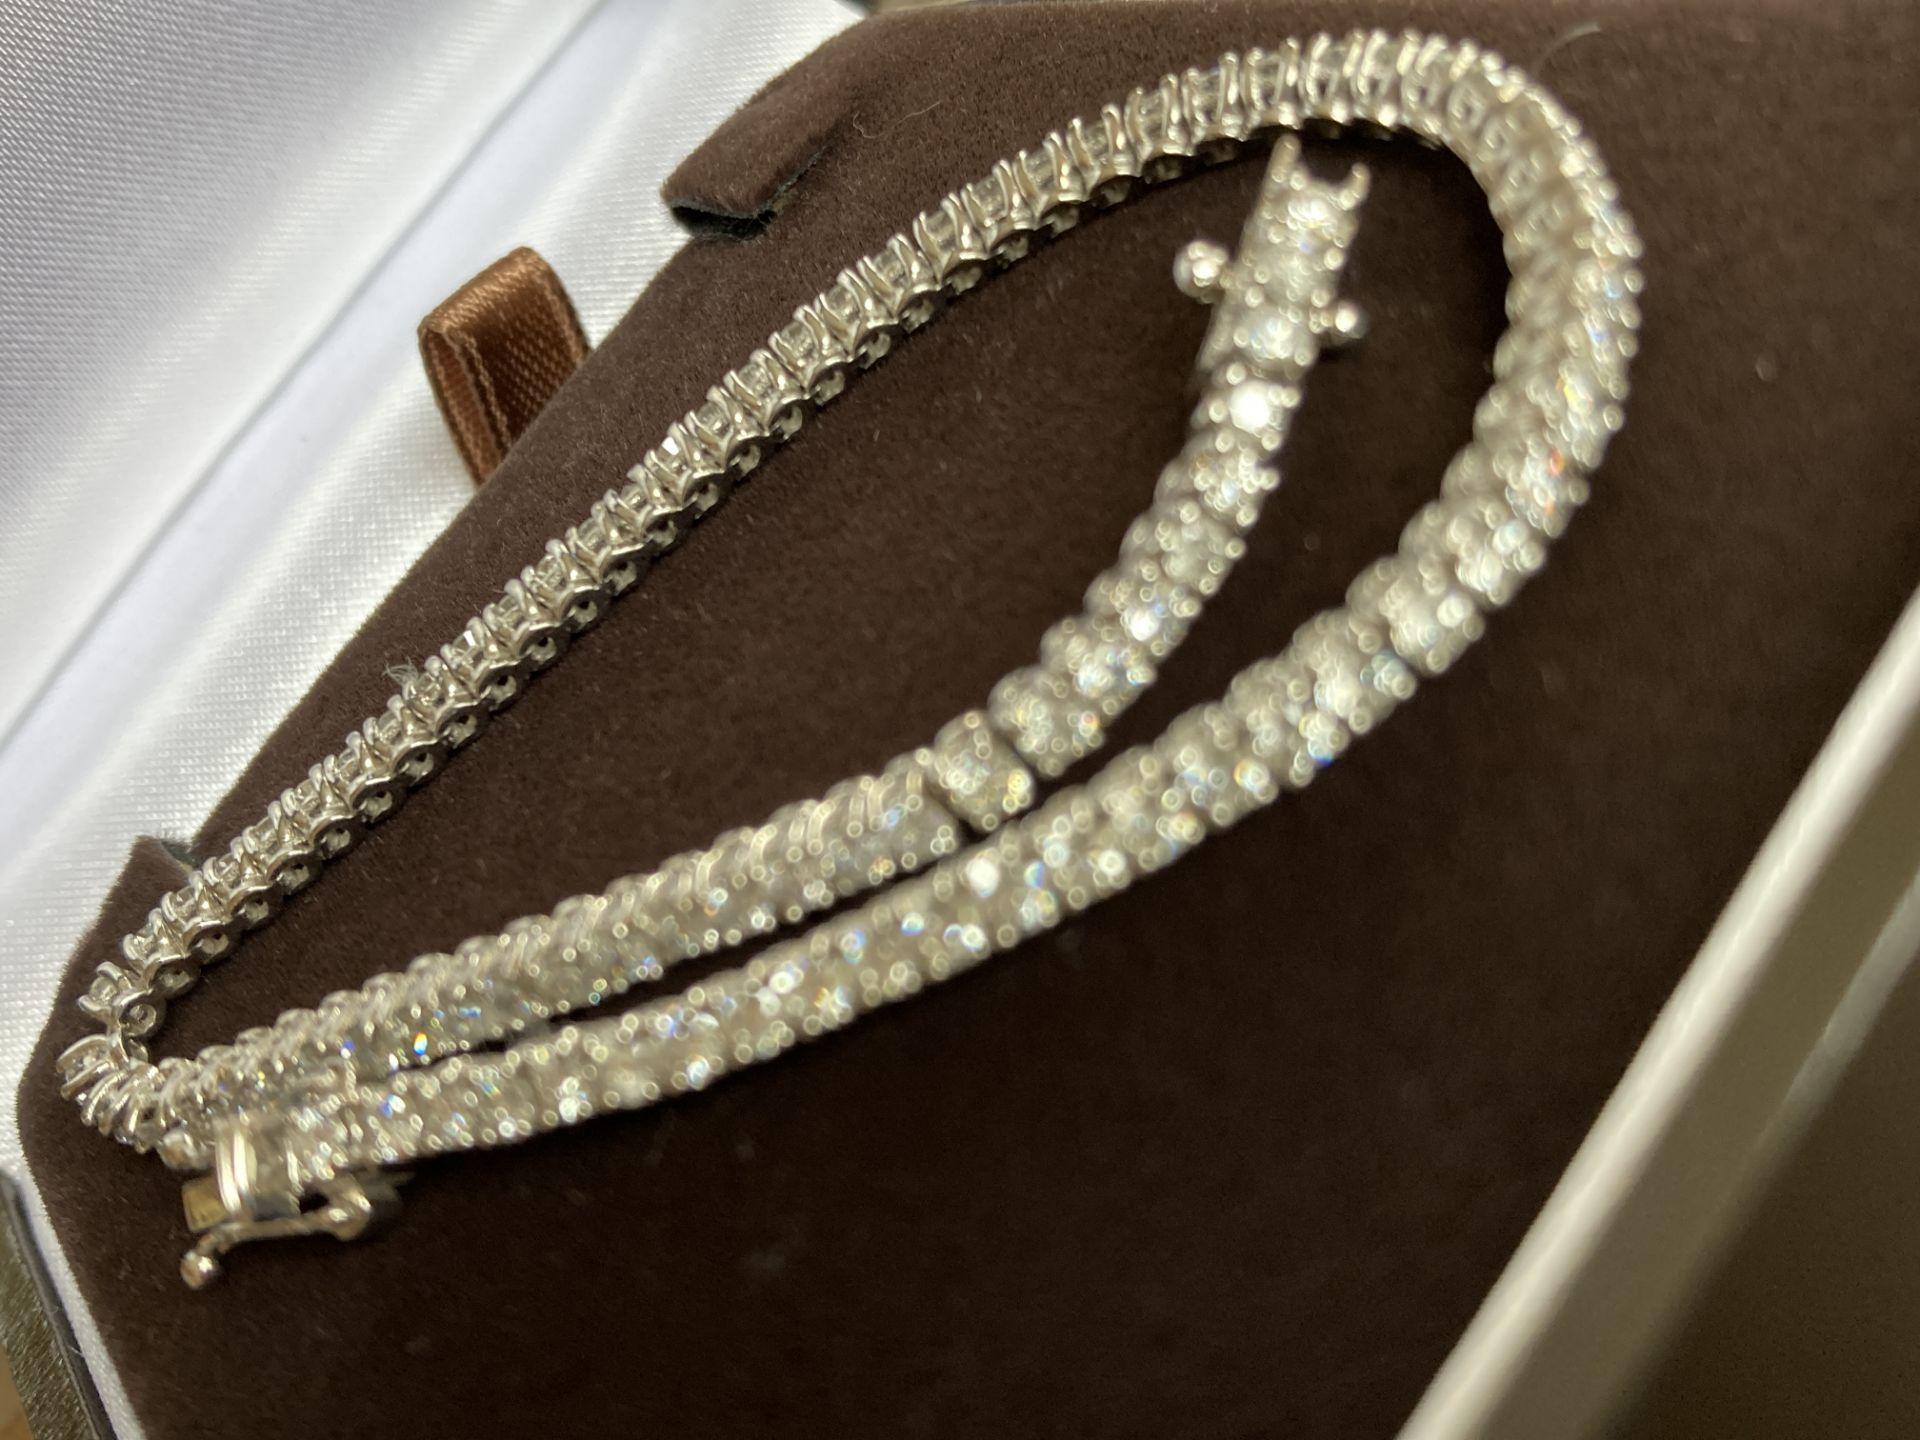 18CT WHITE GOLD 3.2-3.5CT DIAMOND TENNIS BRACELET - Image 3 of 7